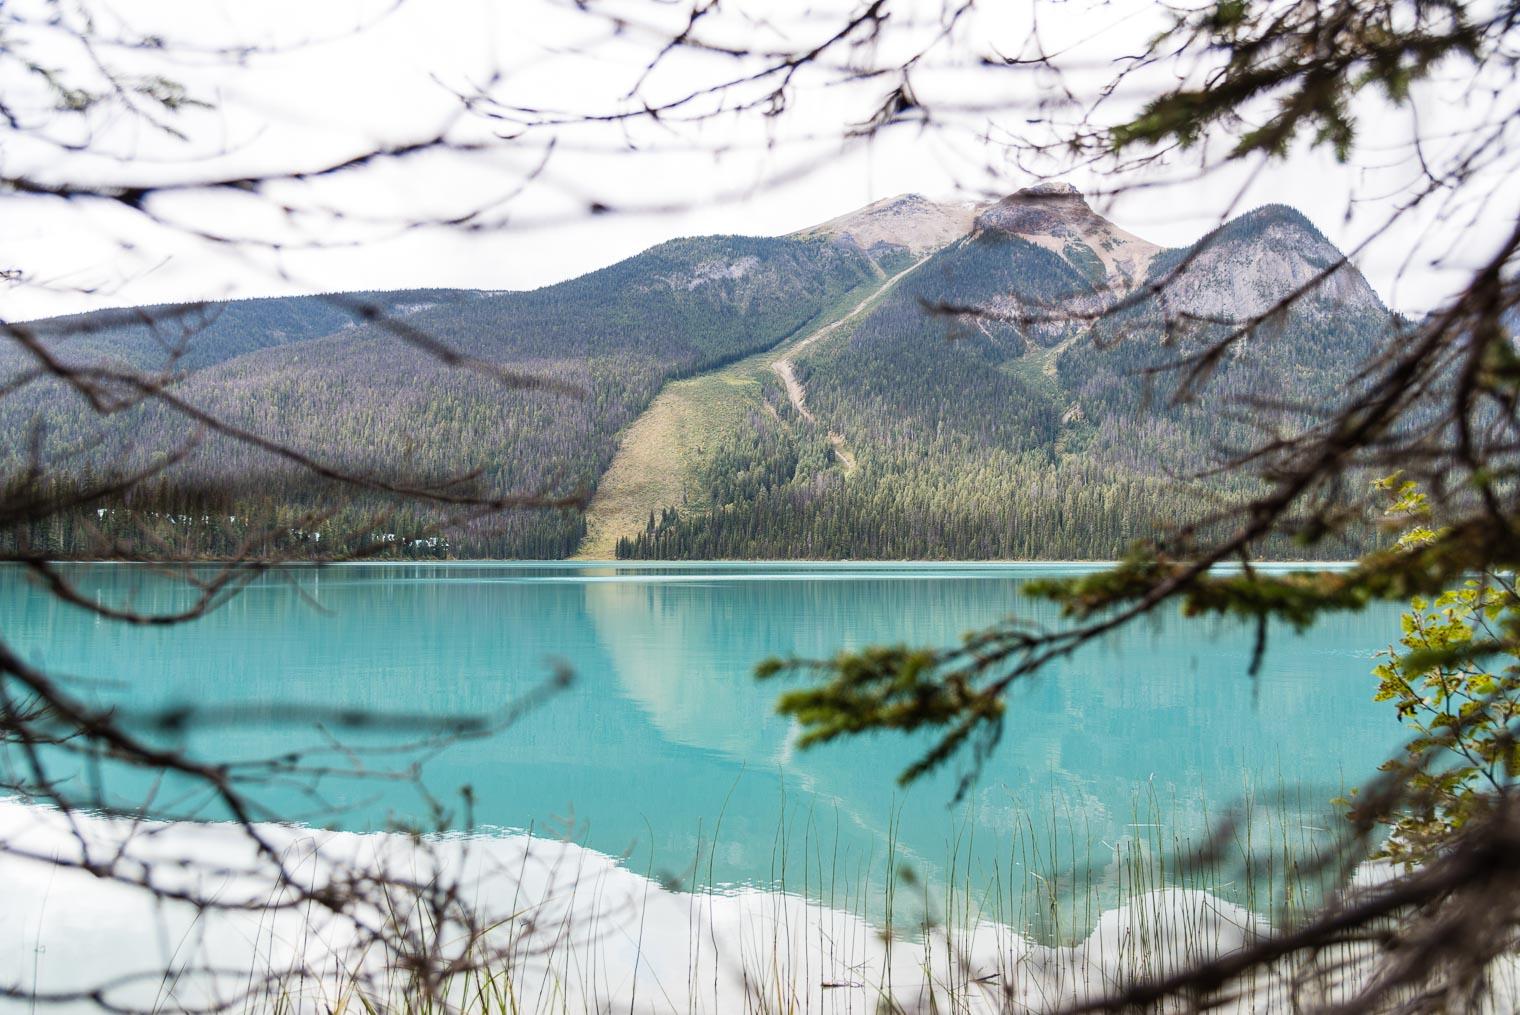 emerald-lake-20168